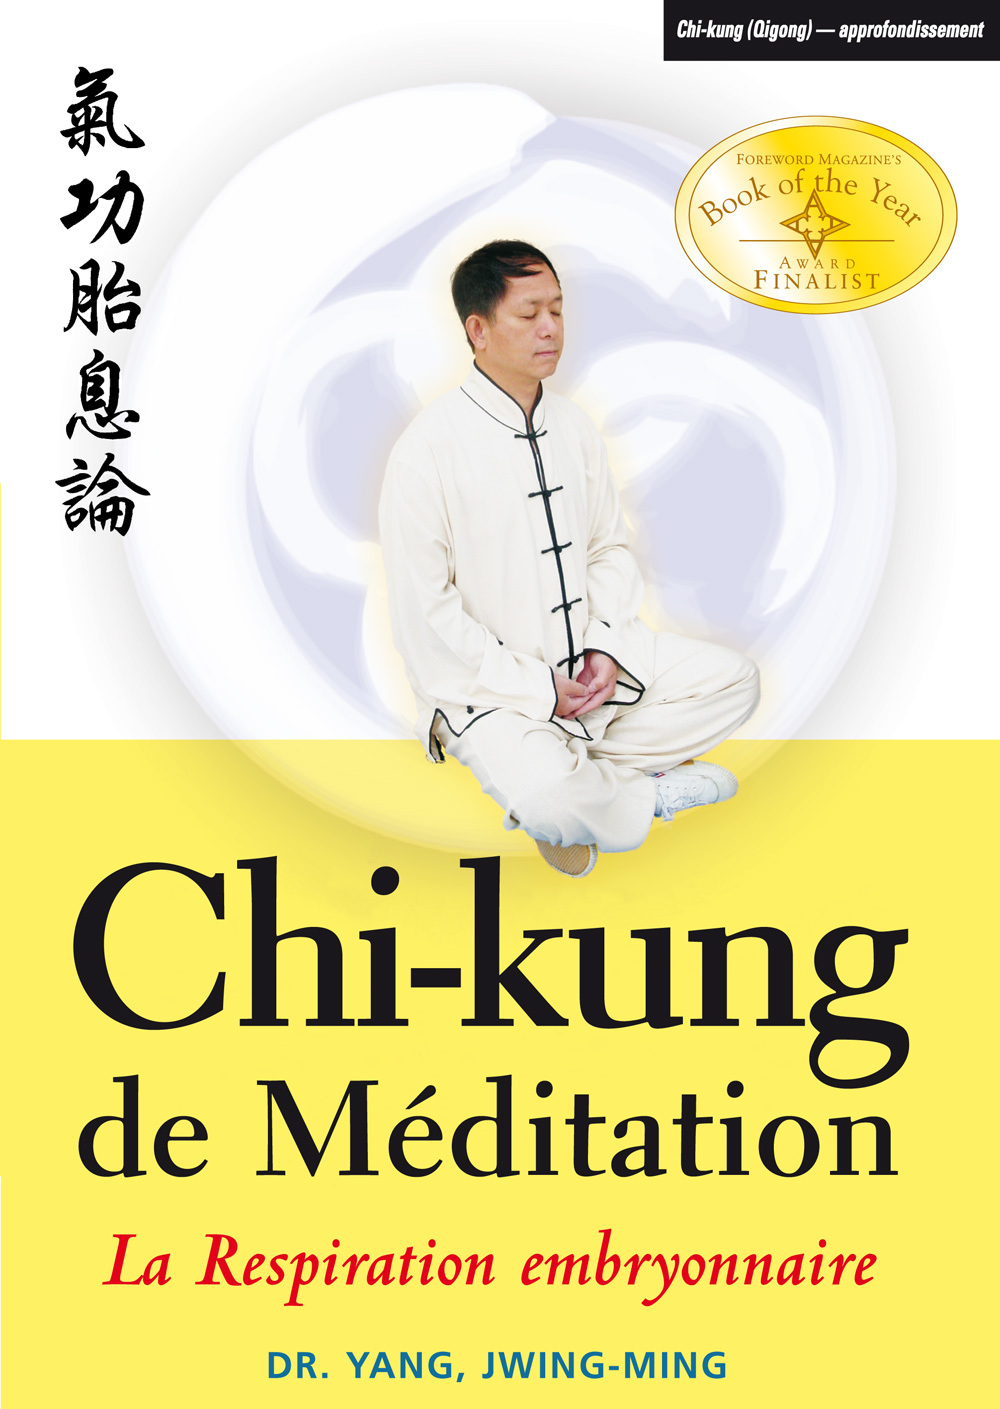 CHI-KUNG MEDITATION : RESP. EMBRYONNAIRE